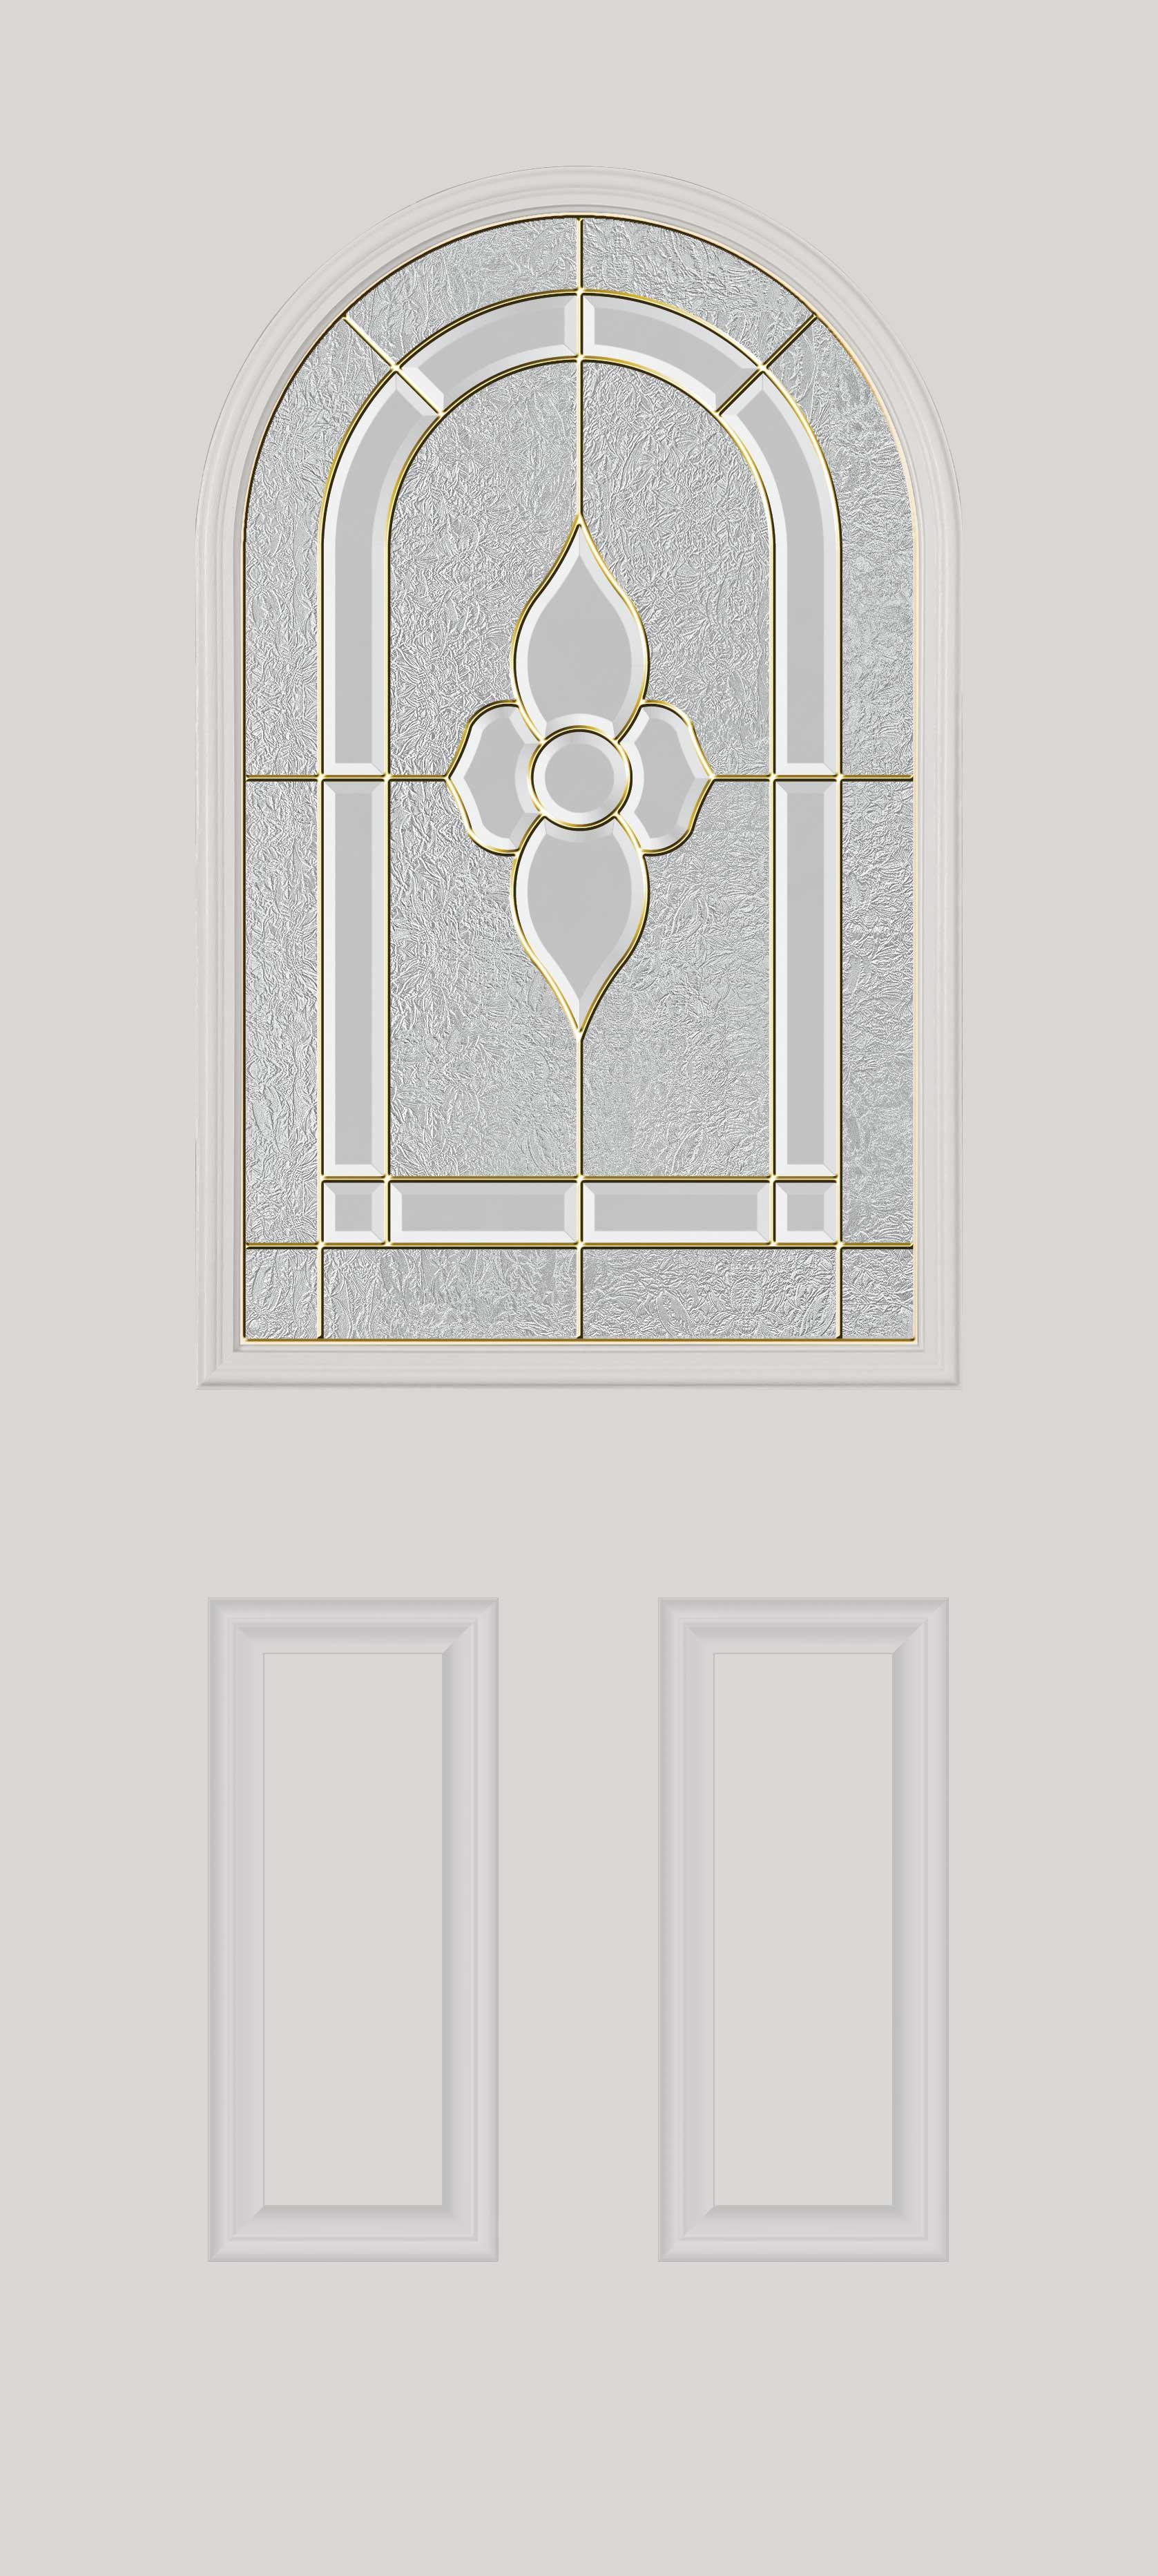 Half-glass door with round top Glass: decorative with nickel caming